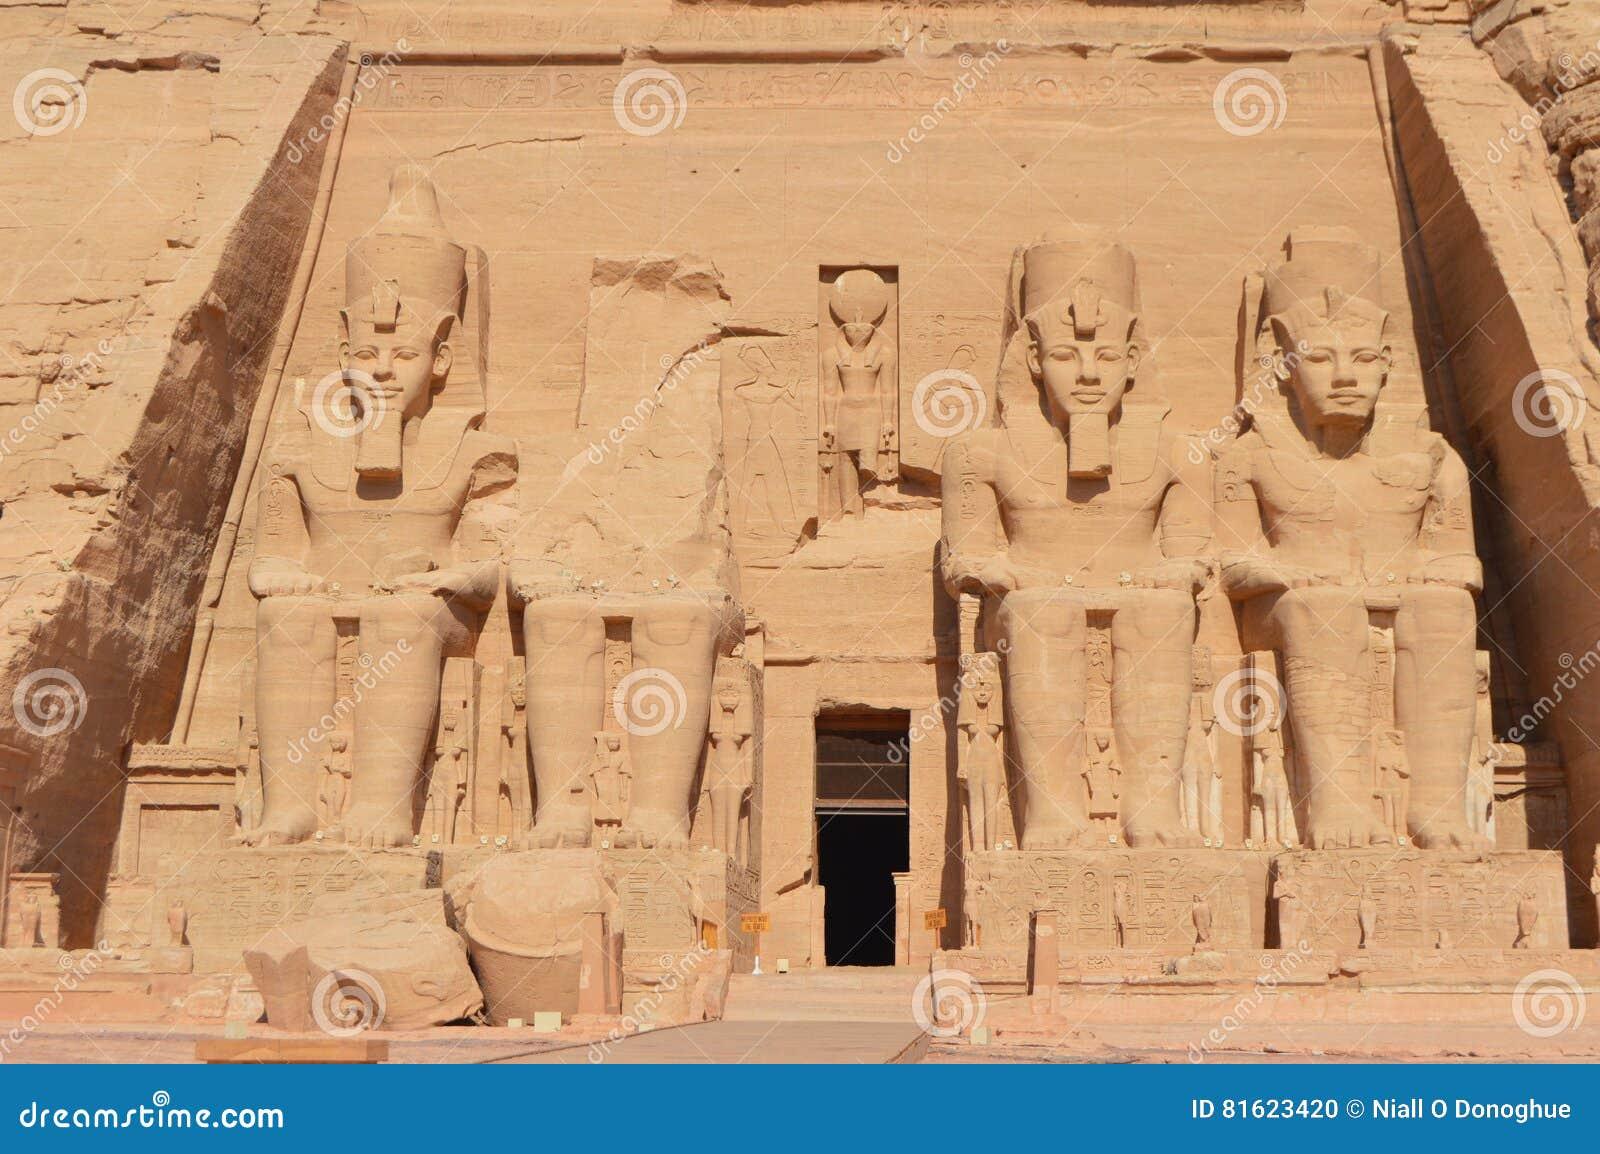 Il monumento antico impressionante ad Abu Simbel